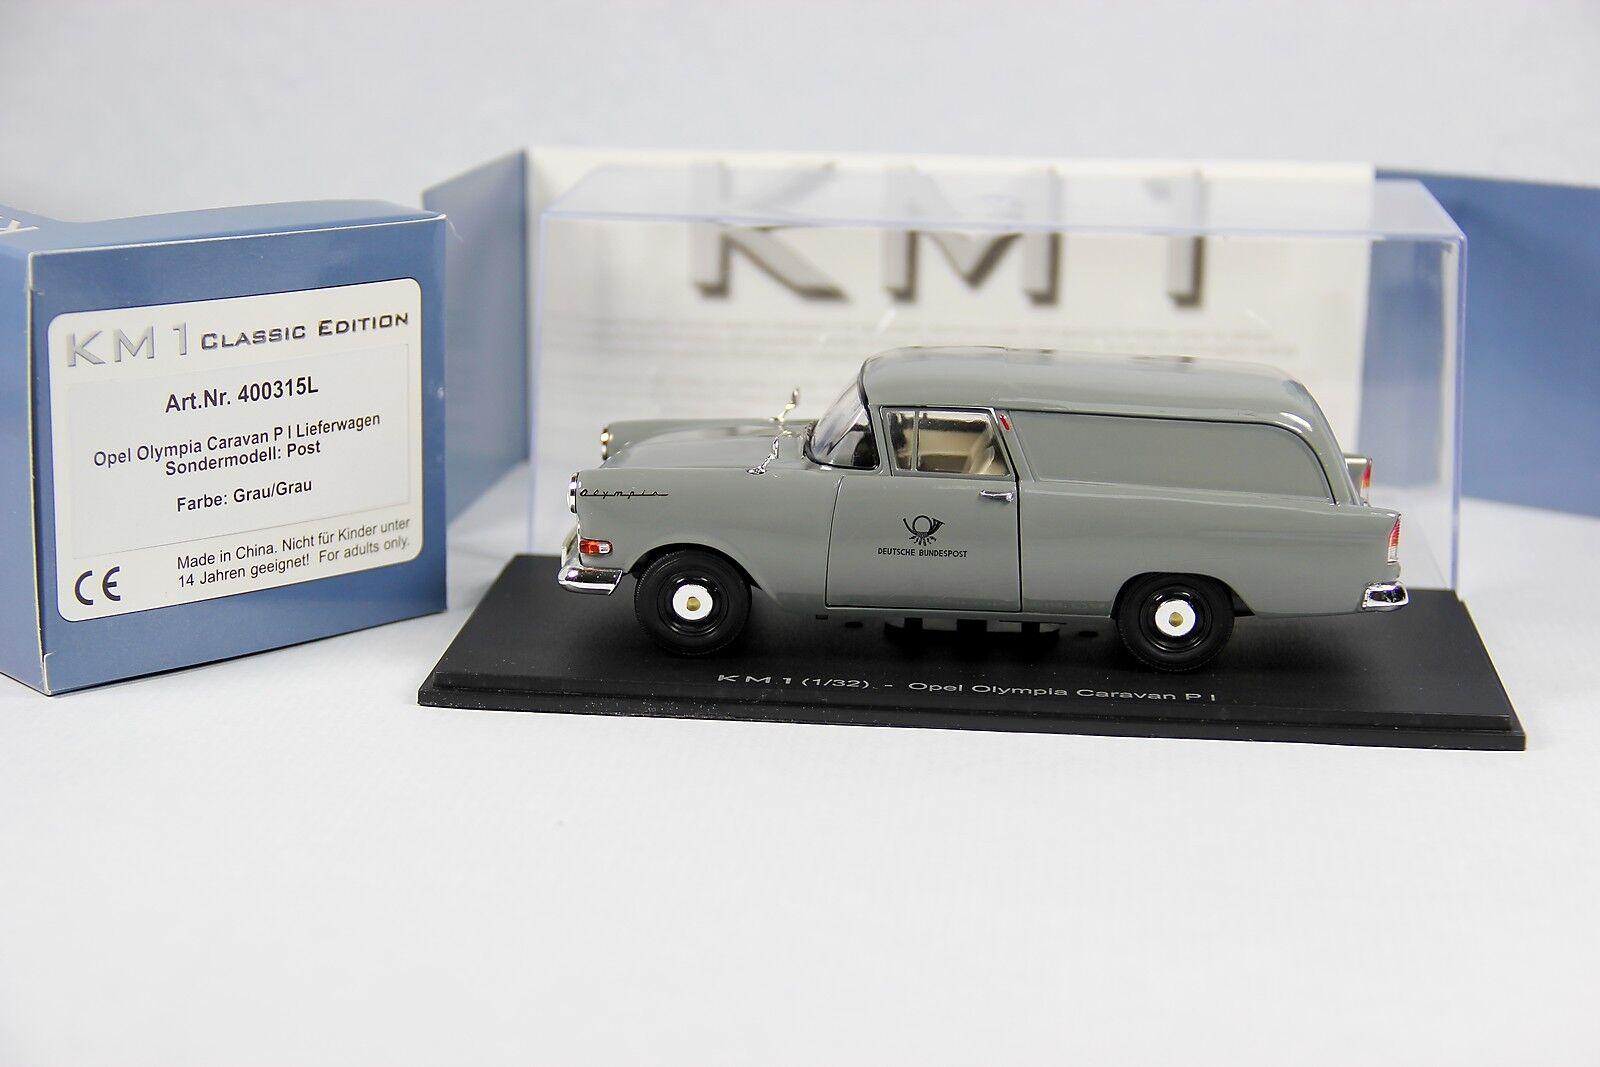 Km1-opel oylmpia Caravan p1-colección post - 1 32 - Art. nº 400315 L